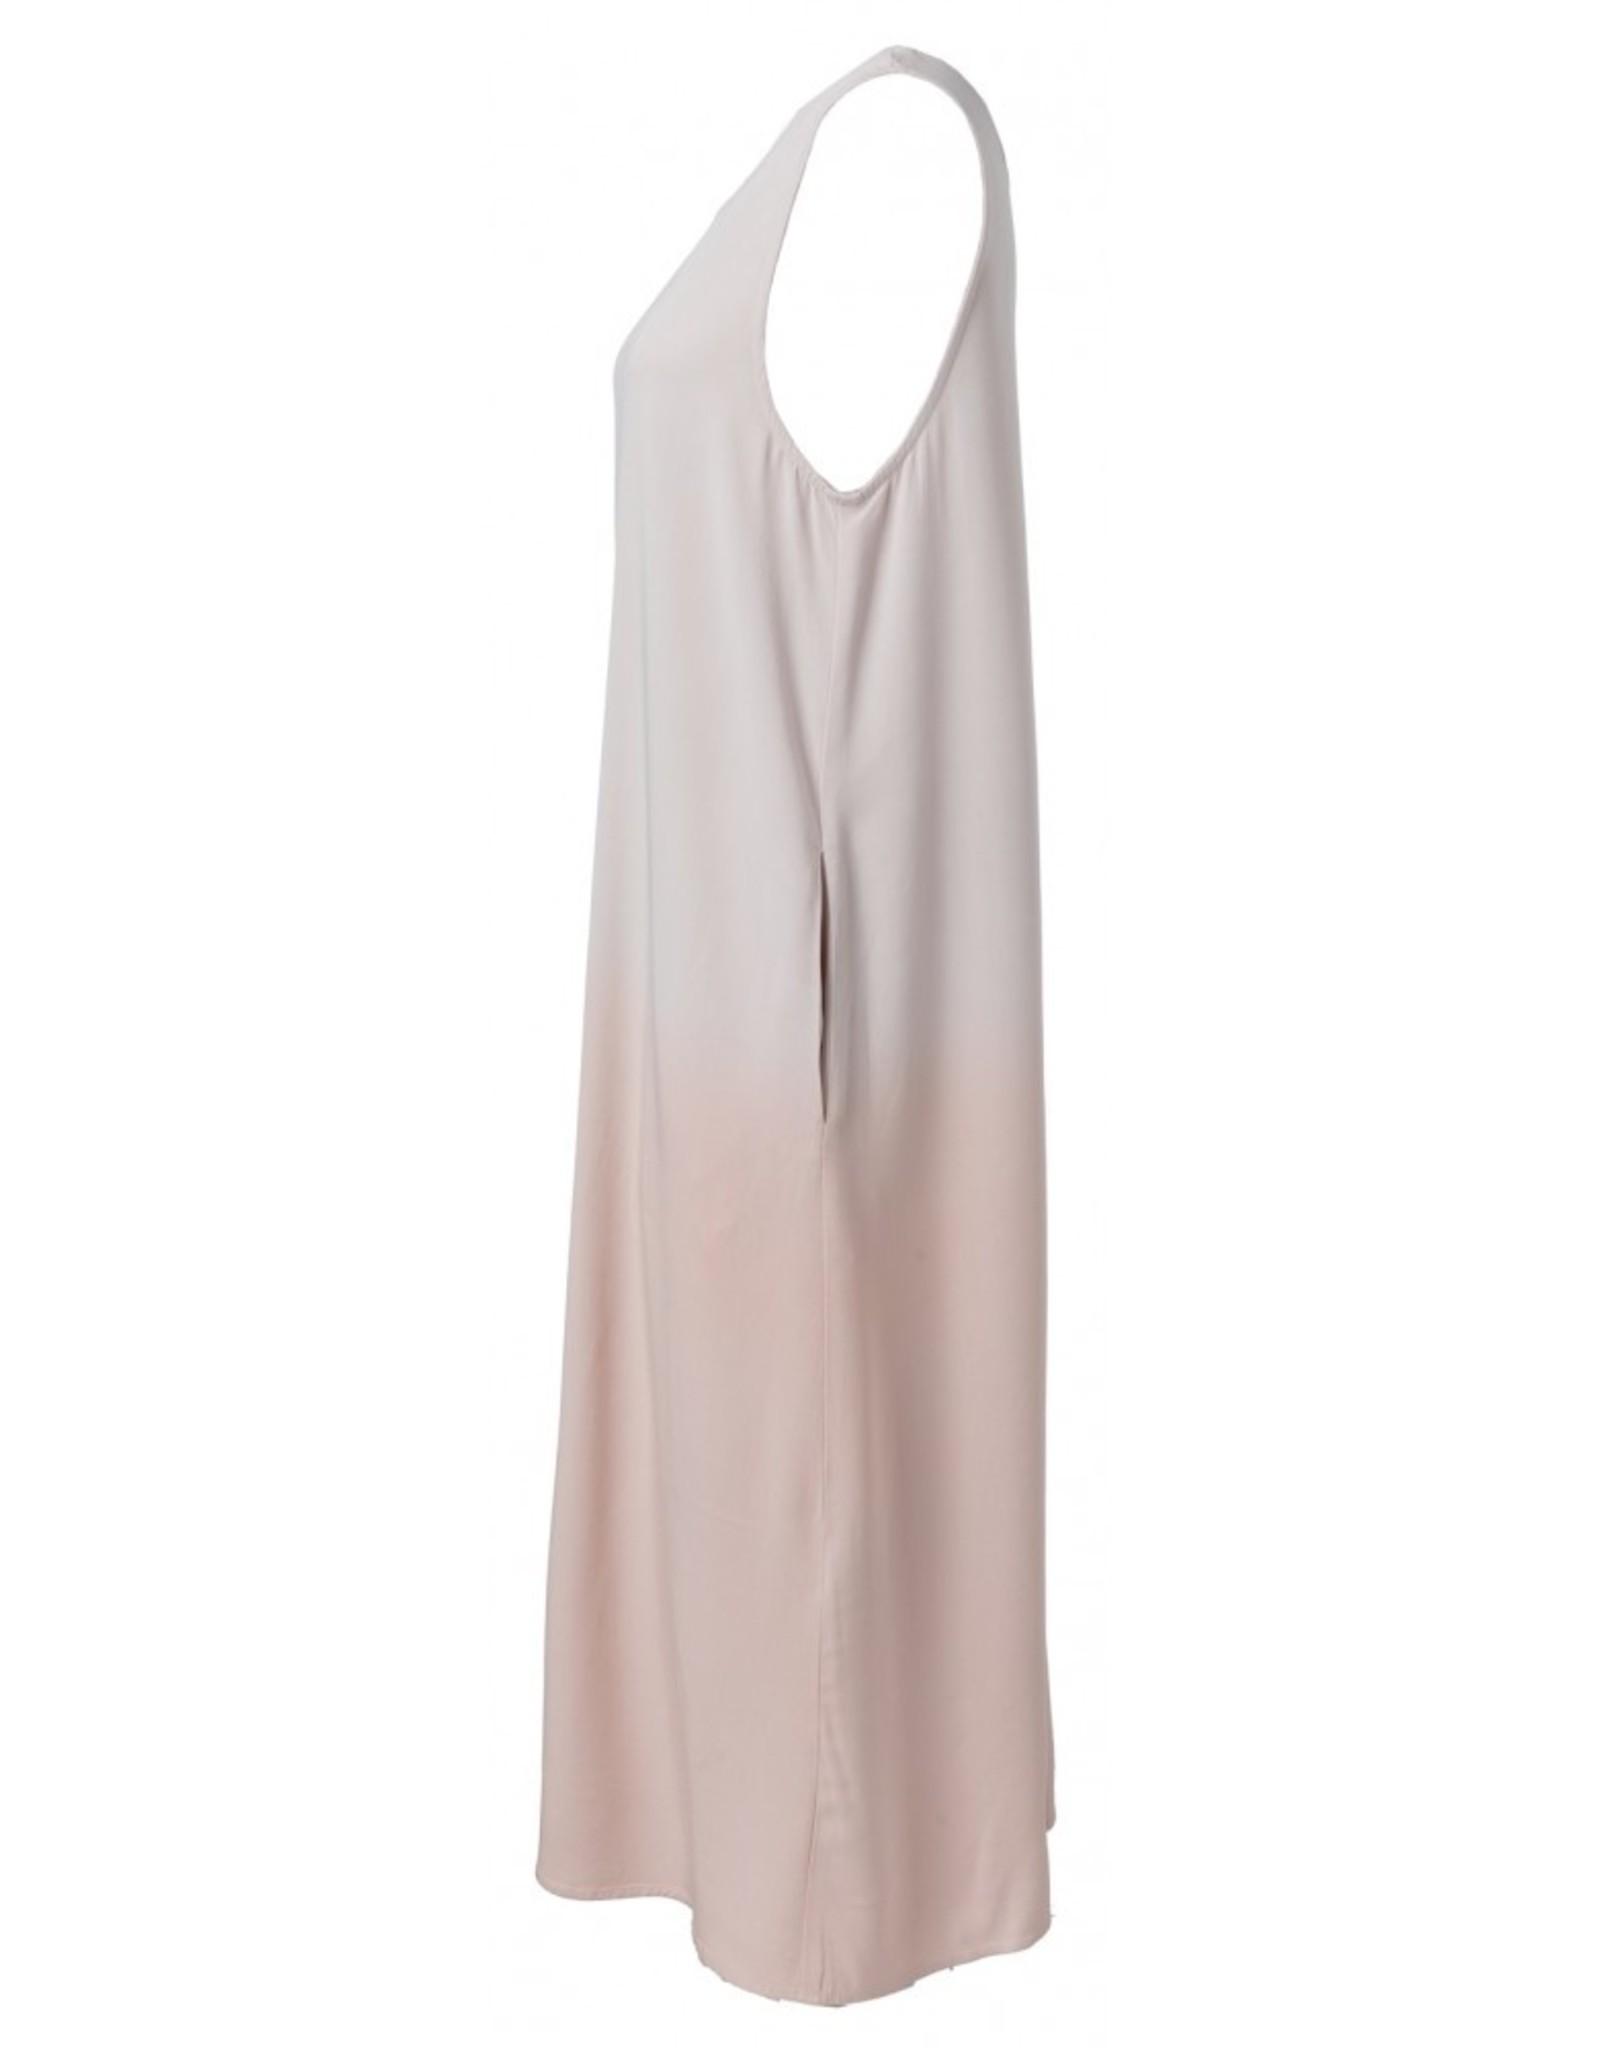 Yaya Dip Dye Dress